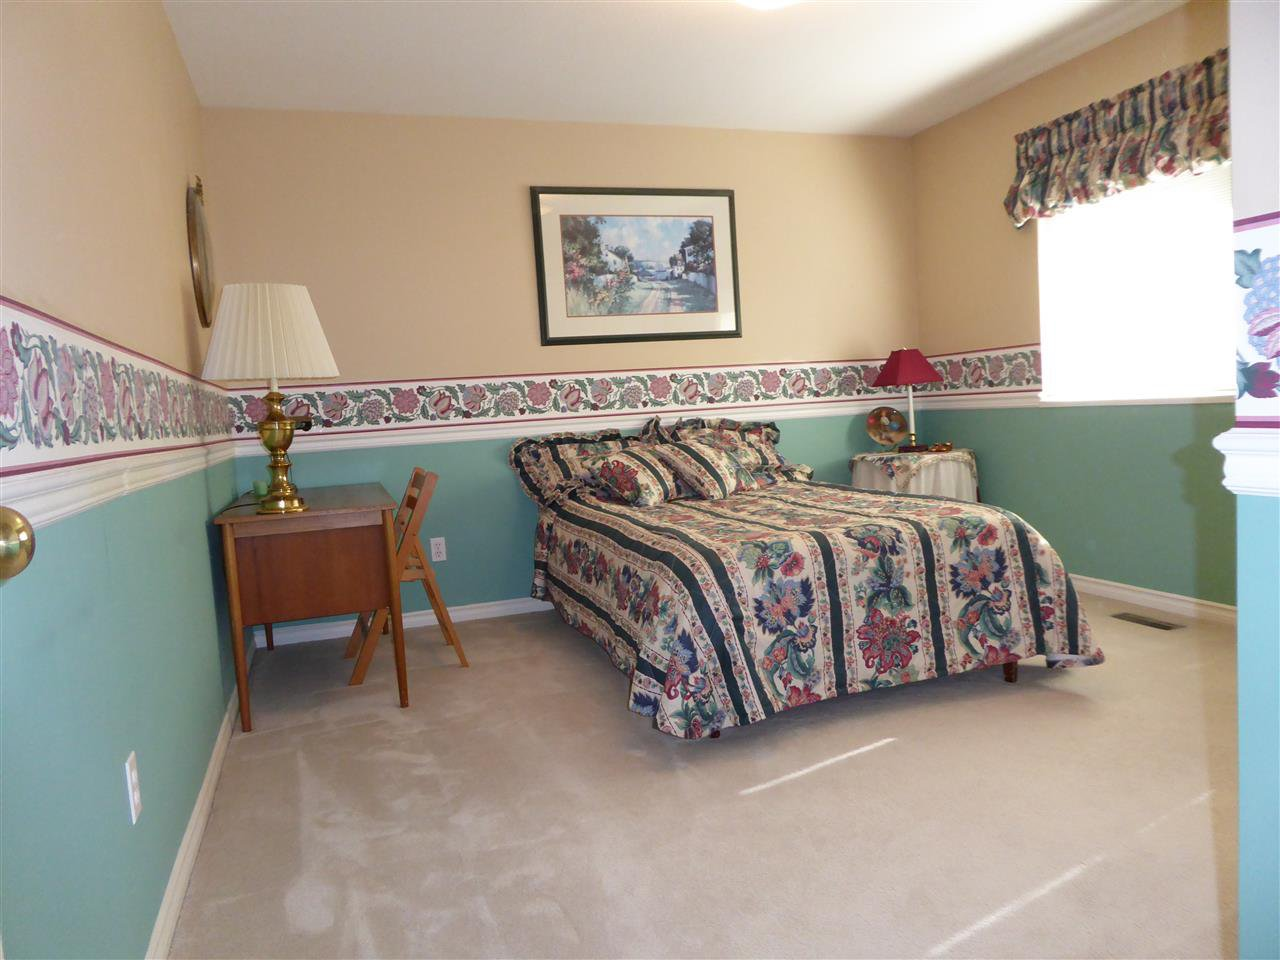 Photo 14: Photos: 1252 DEWAR Way in Port Coquitlam: Citadel PQ House for sale : MLS®# R2199639